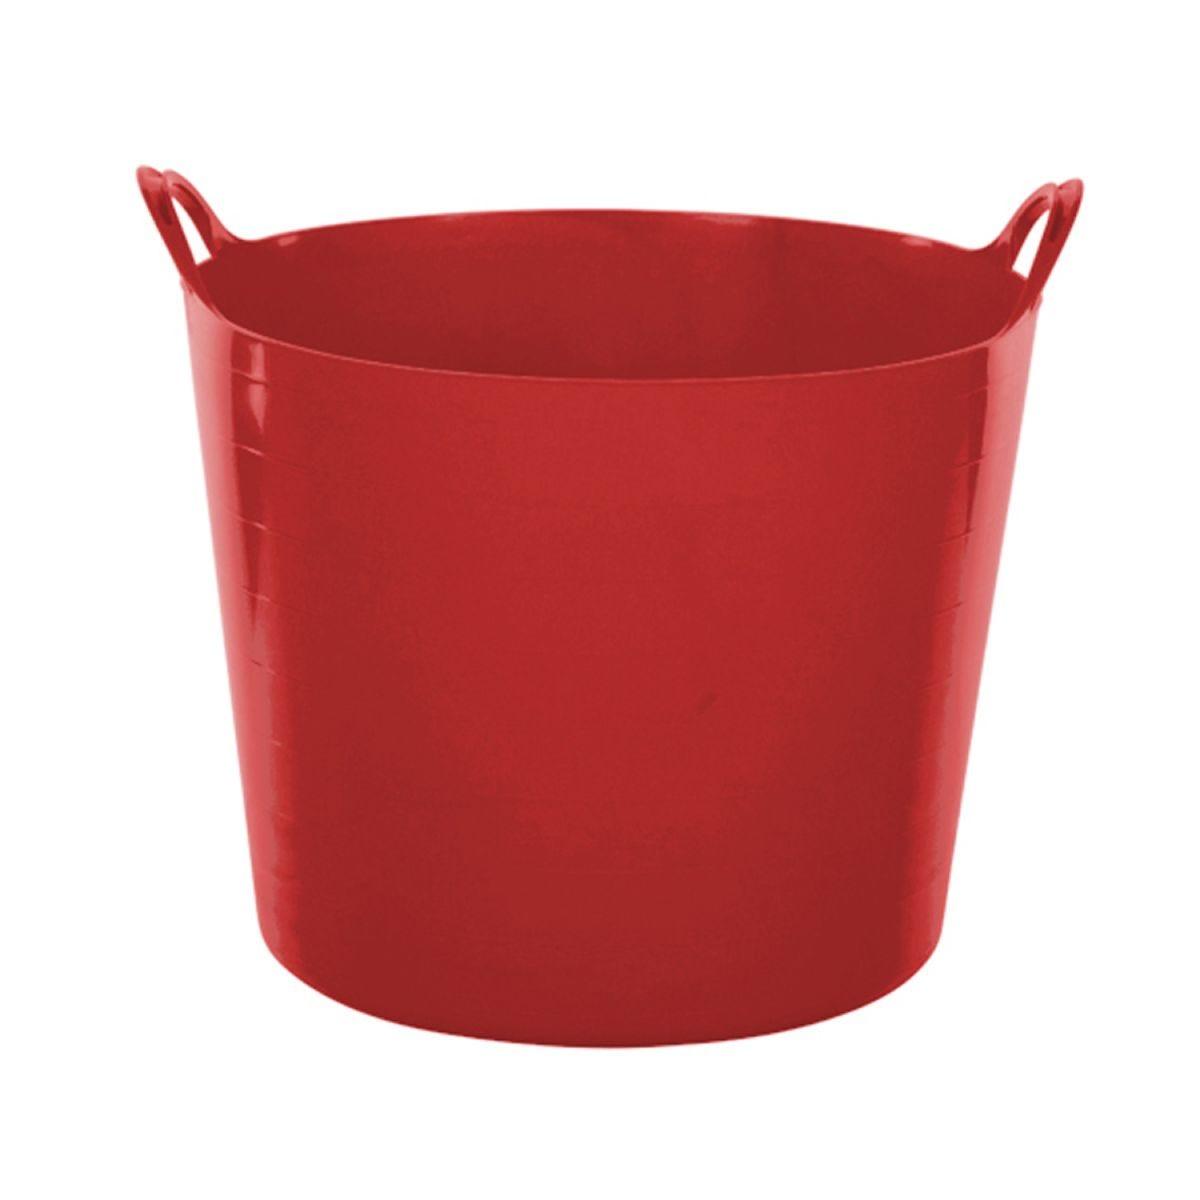 Whitefurze 14L Flexible Tub – Red